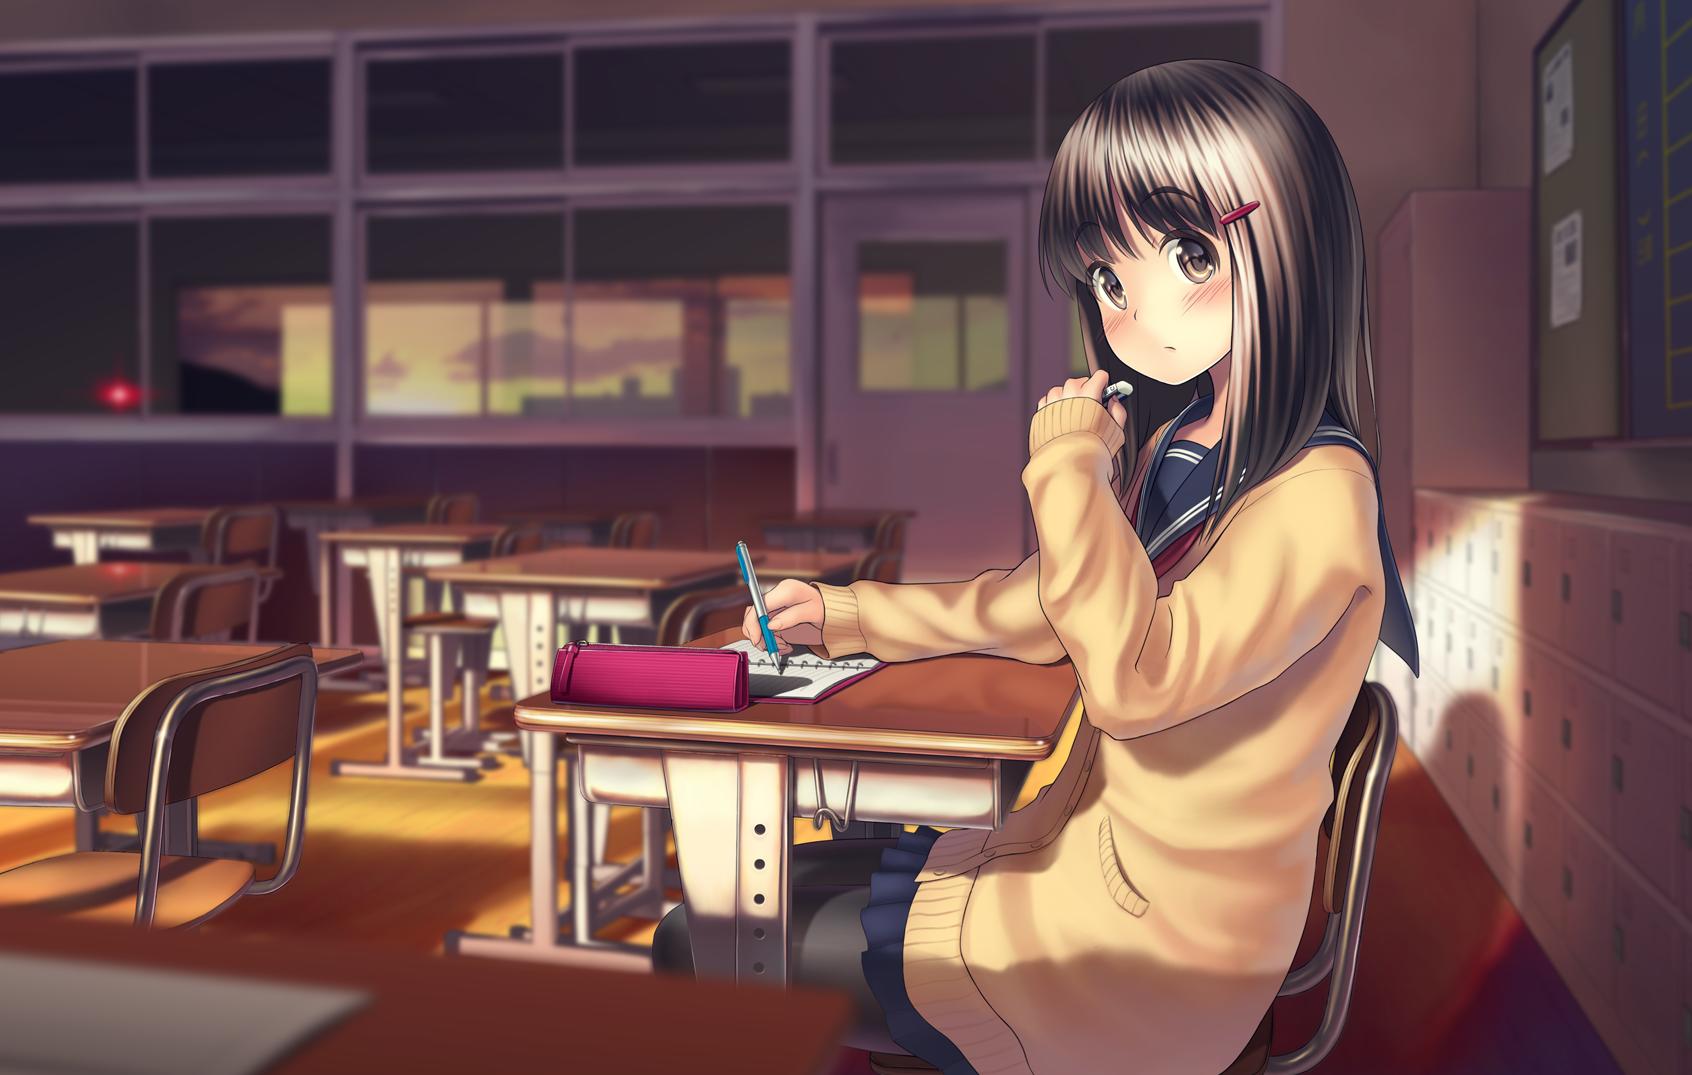 hinh nen anime girl dang yeu 19